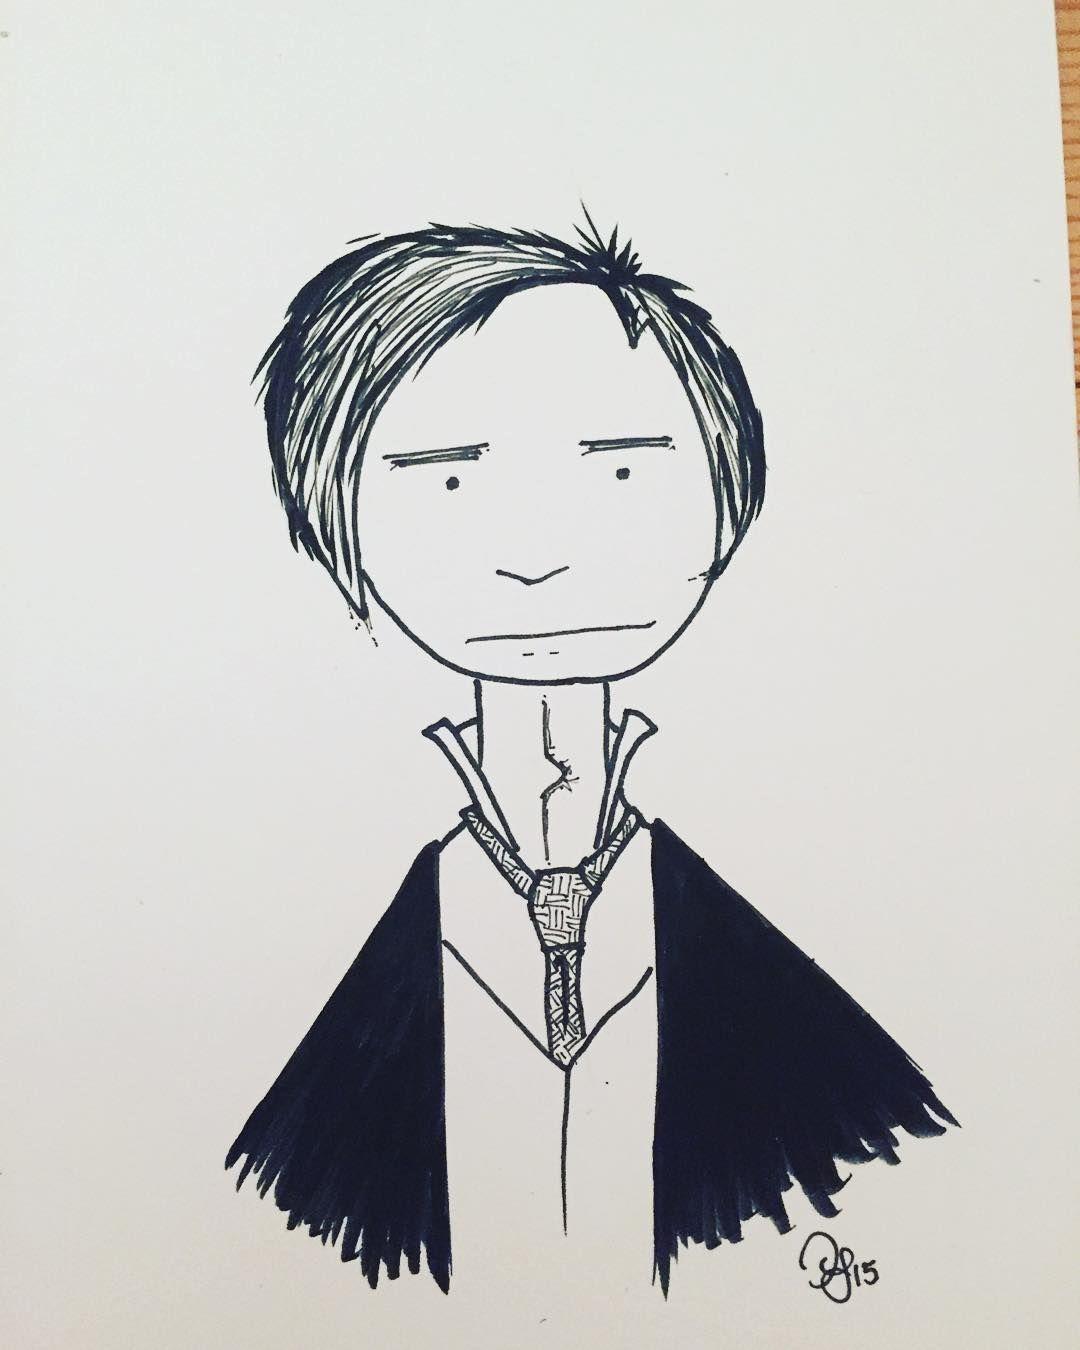 #inktober Day 29: Ichabod Crane #kuretake #usa #dearjetpens #manuscriptinktober @manuscriptpenco #inktober2015